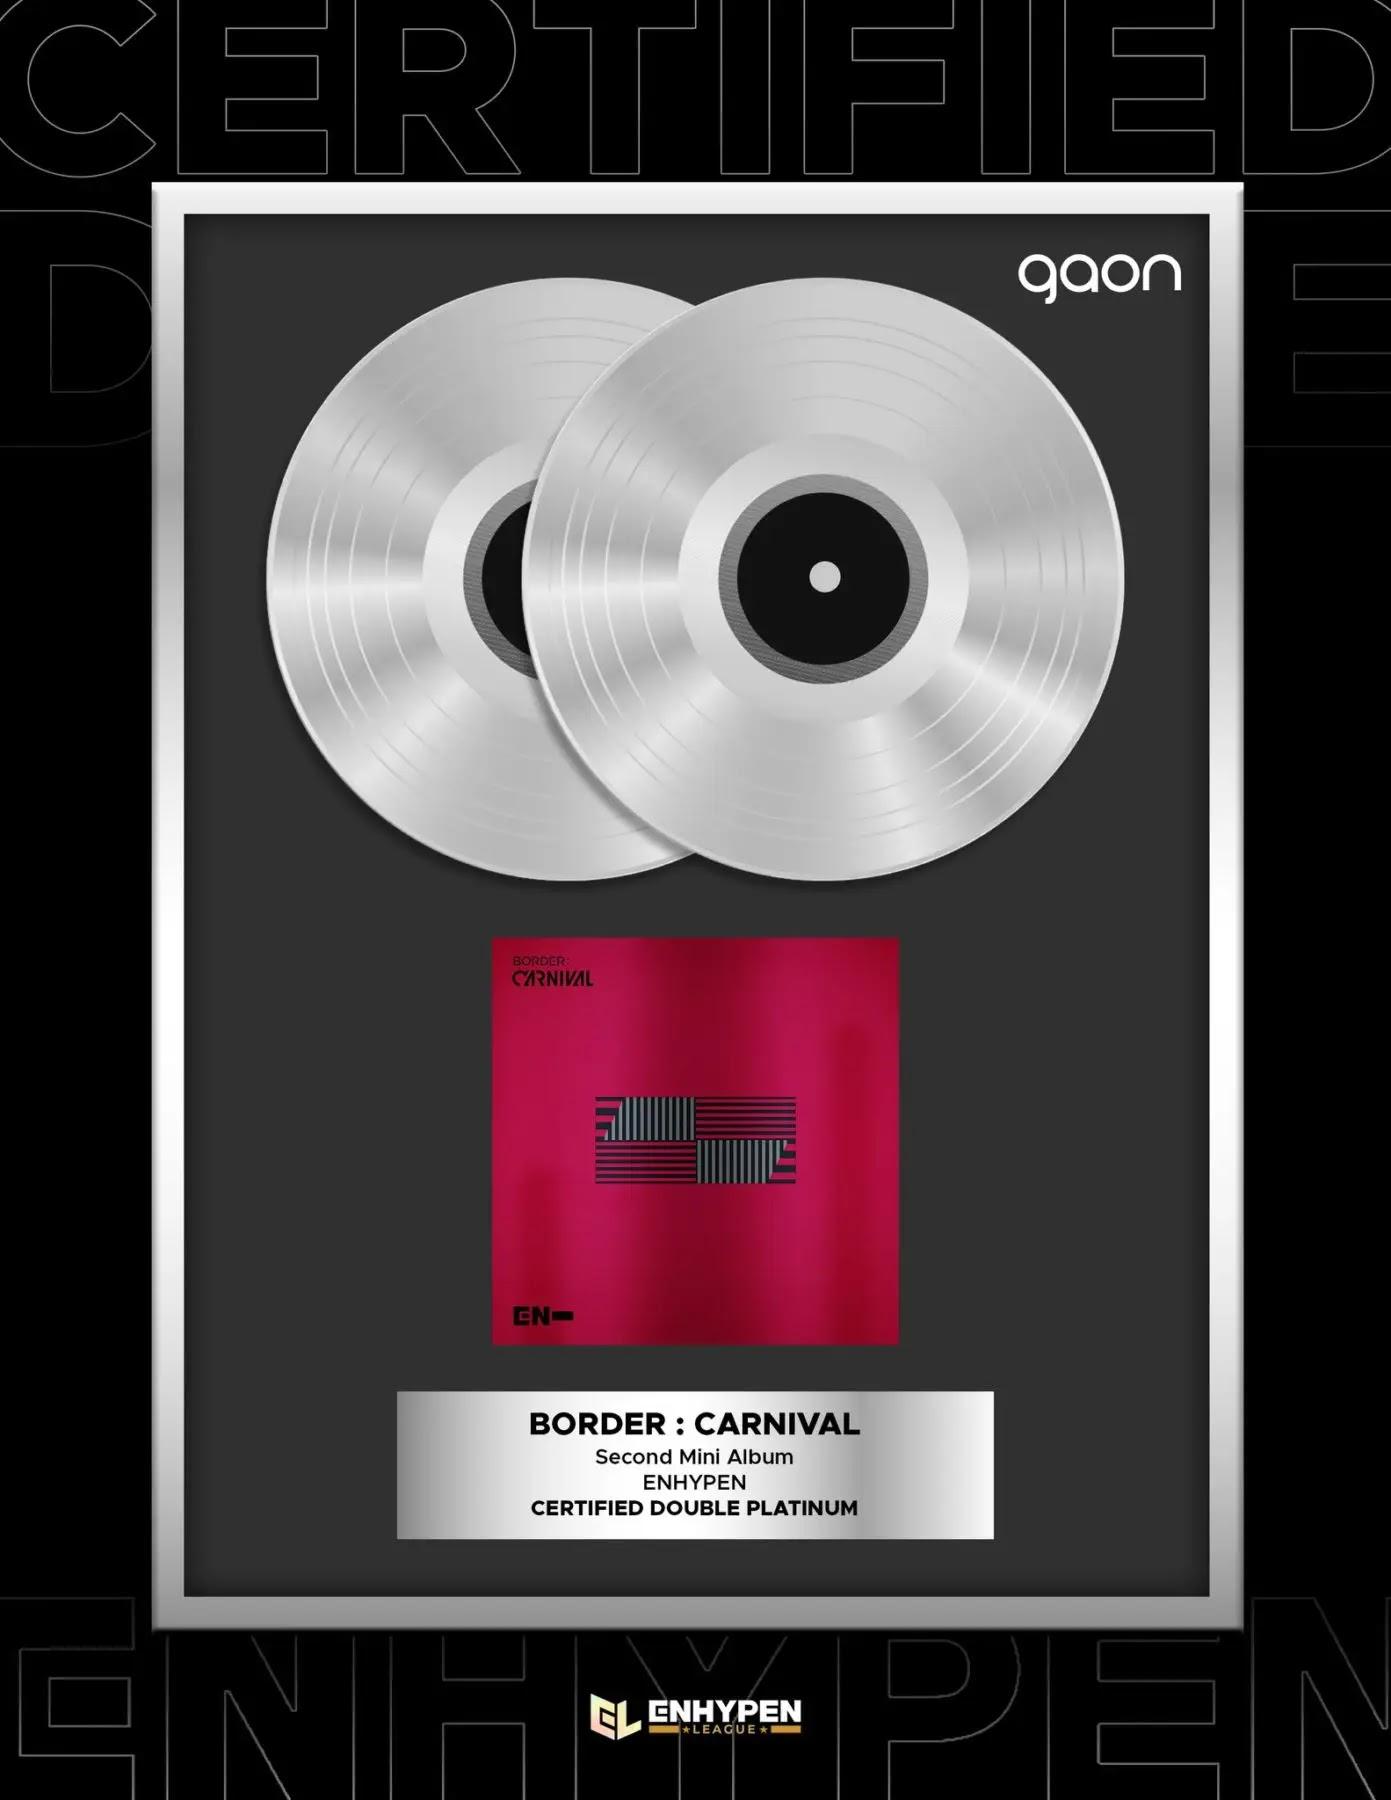 ENHYPEN Album 'BORDER: CARNIVAL' Gets Double Platinum Gaon and Gold RIAJ Certificates